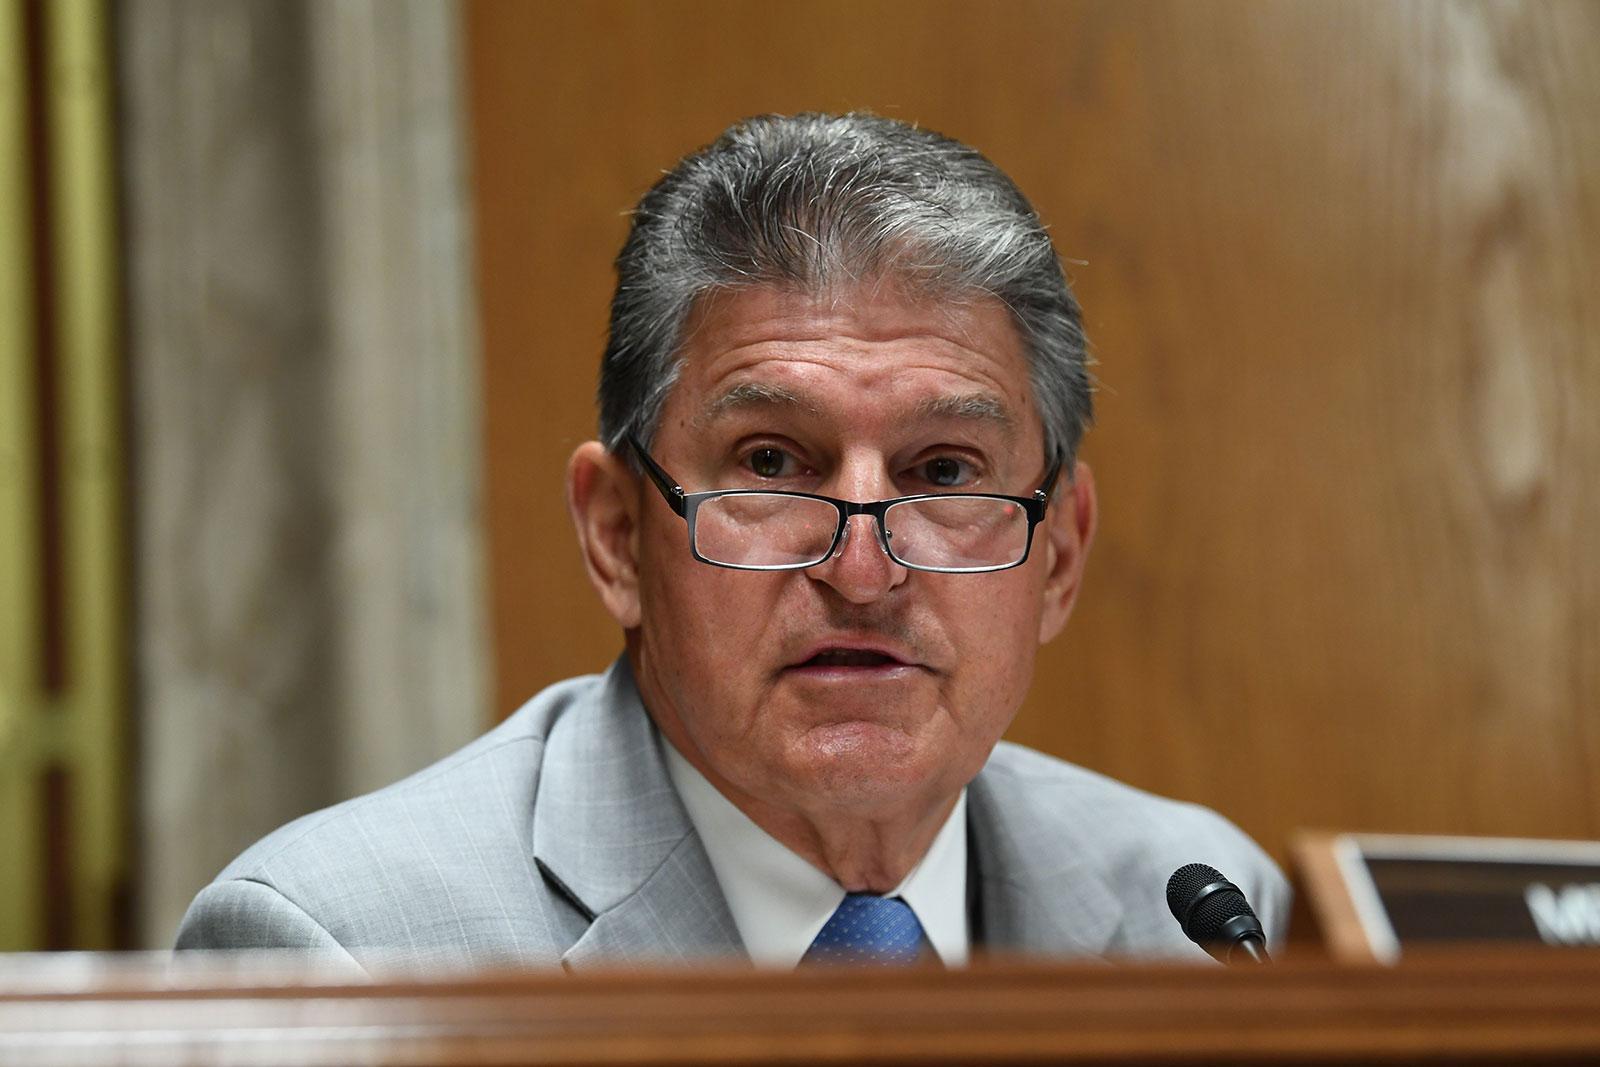 Senator Joe Manchin speaks during a hearing on June 16.